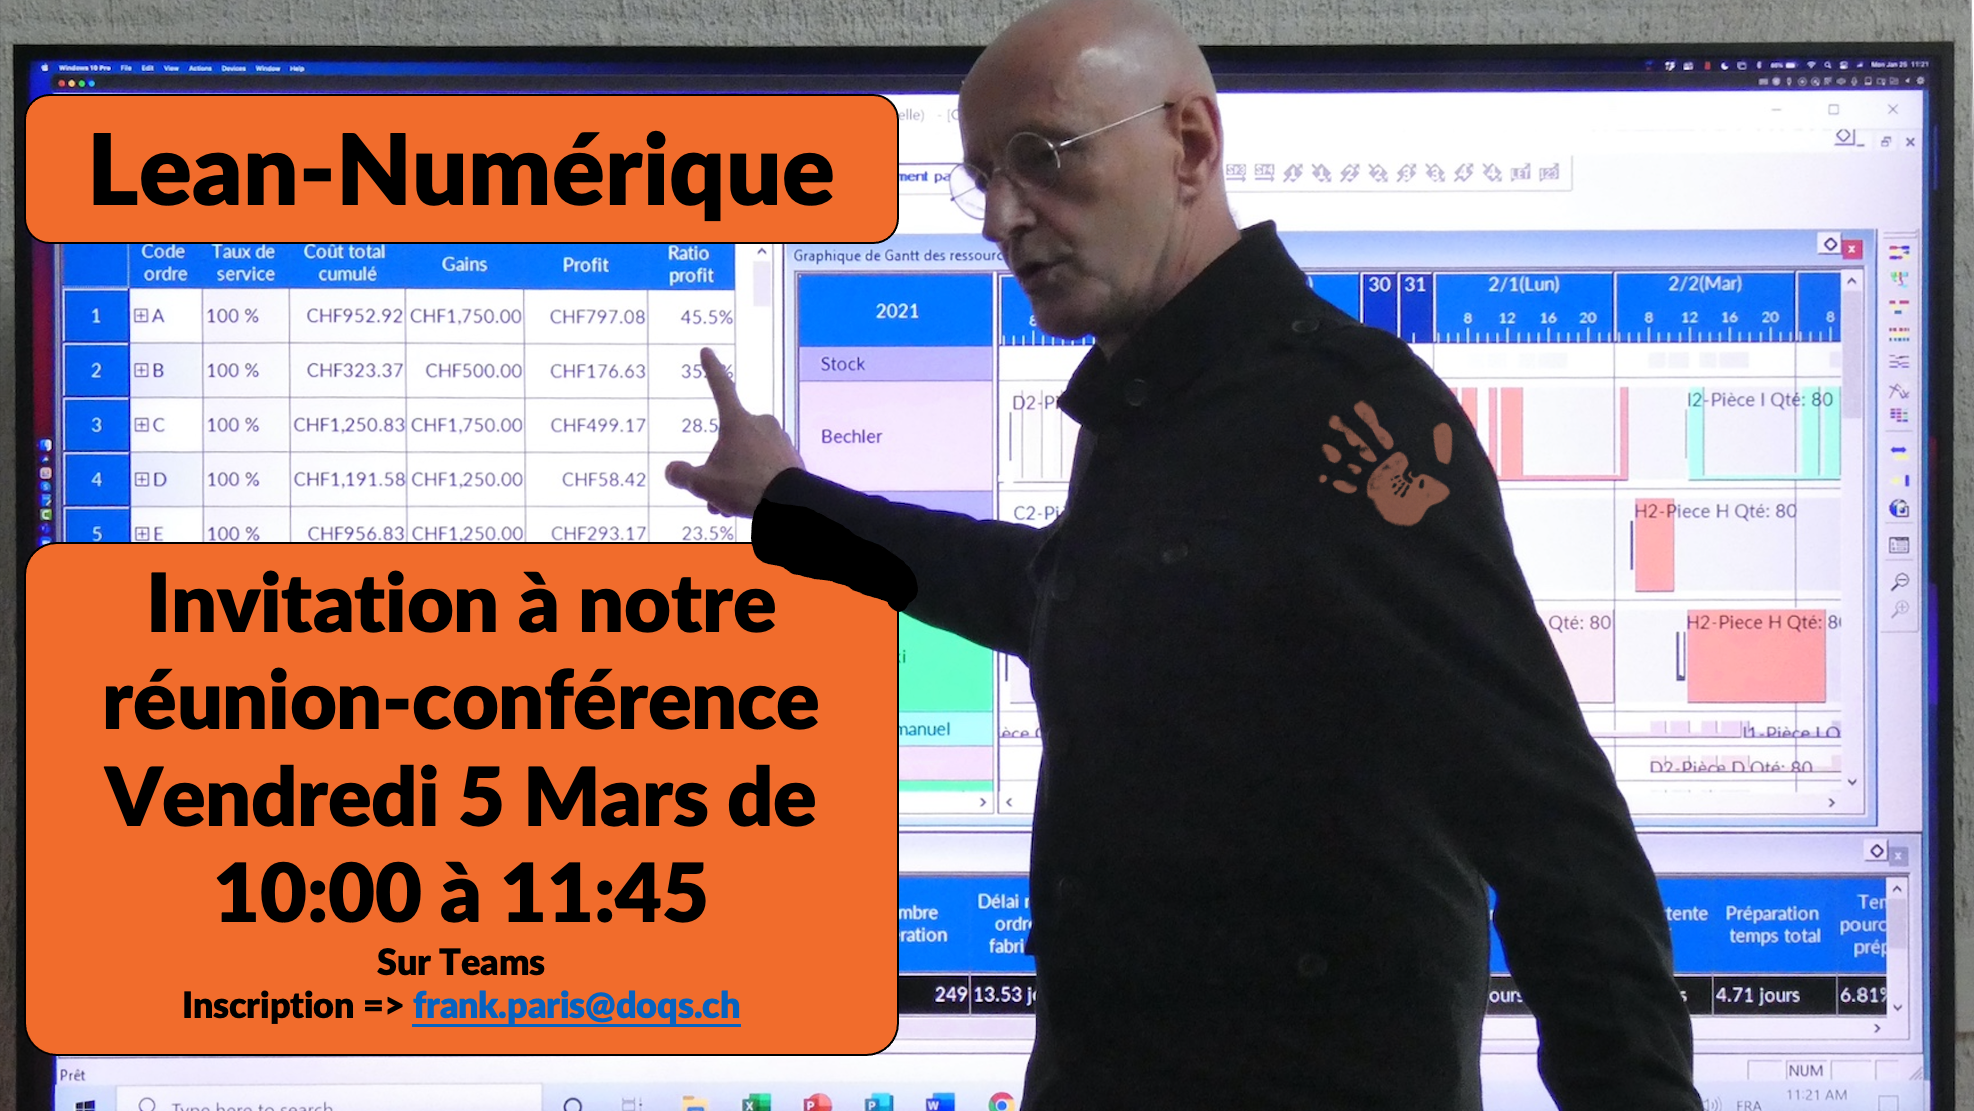 Invitation Réunion-Conférence le 5 Mars